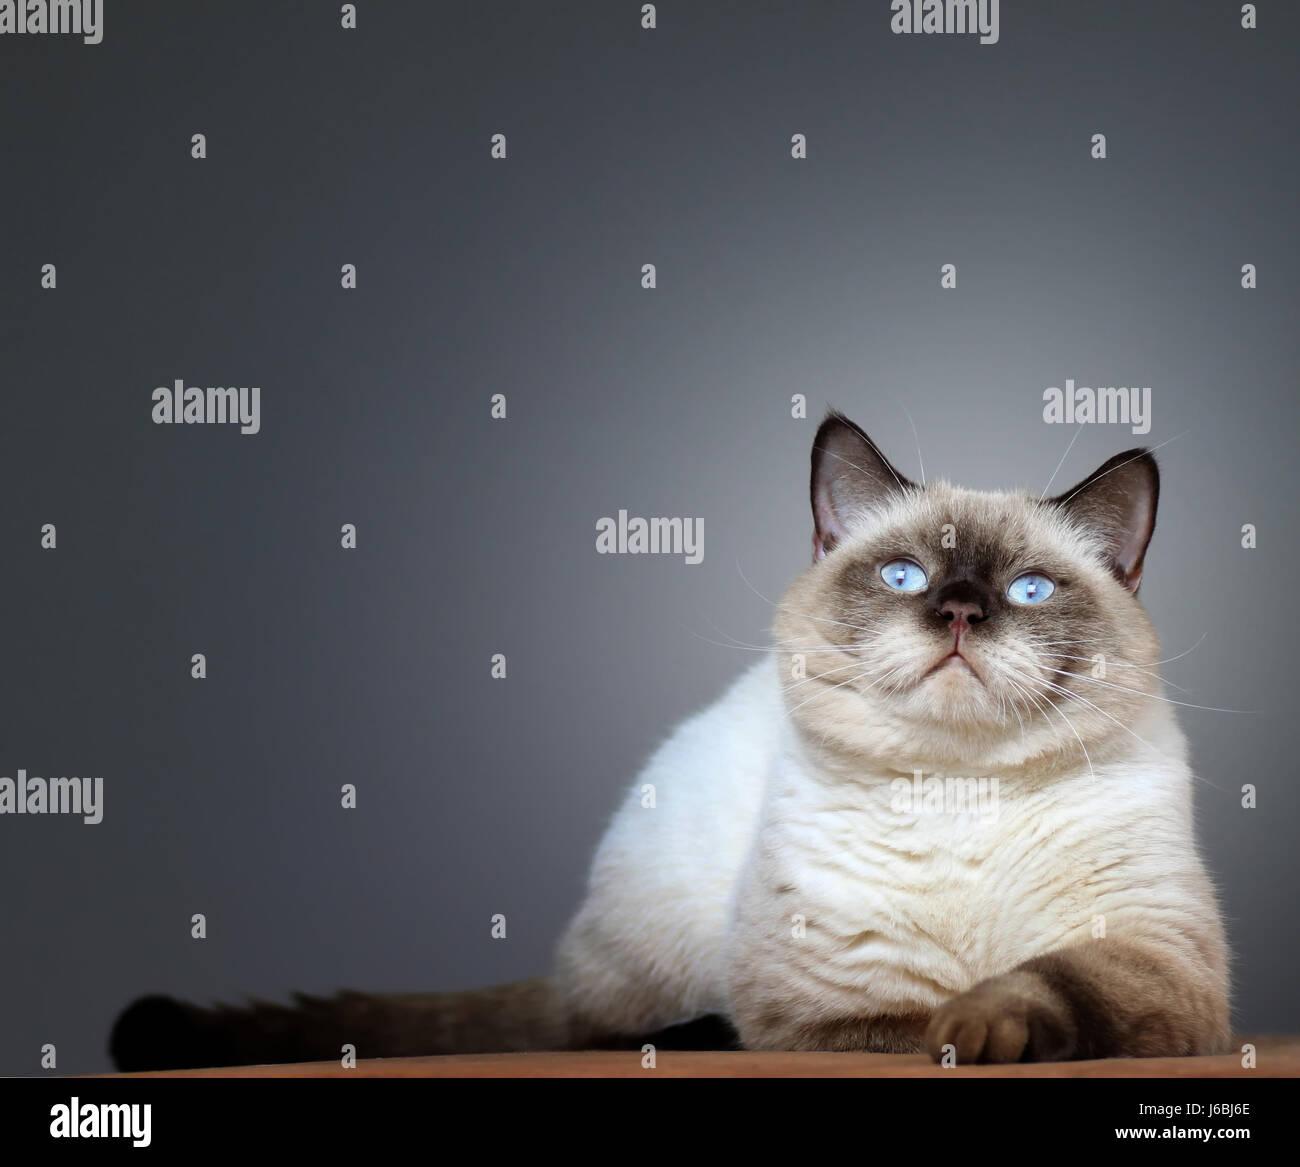 british britisch briton pussycat cat domestic cat pet skin expression british Stock Photo